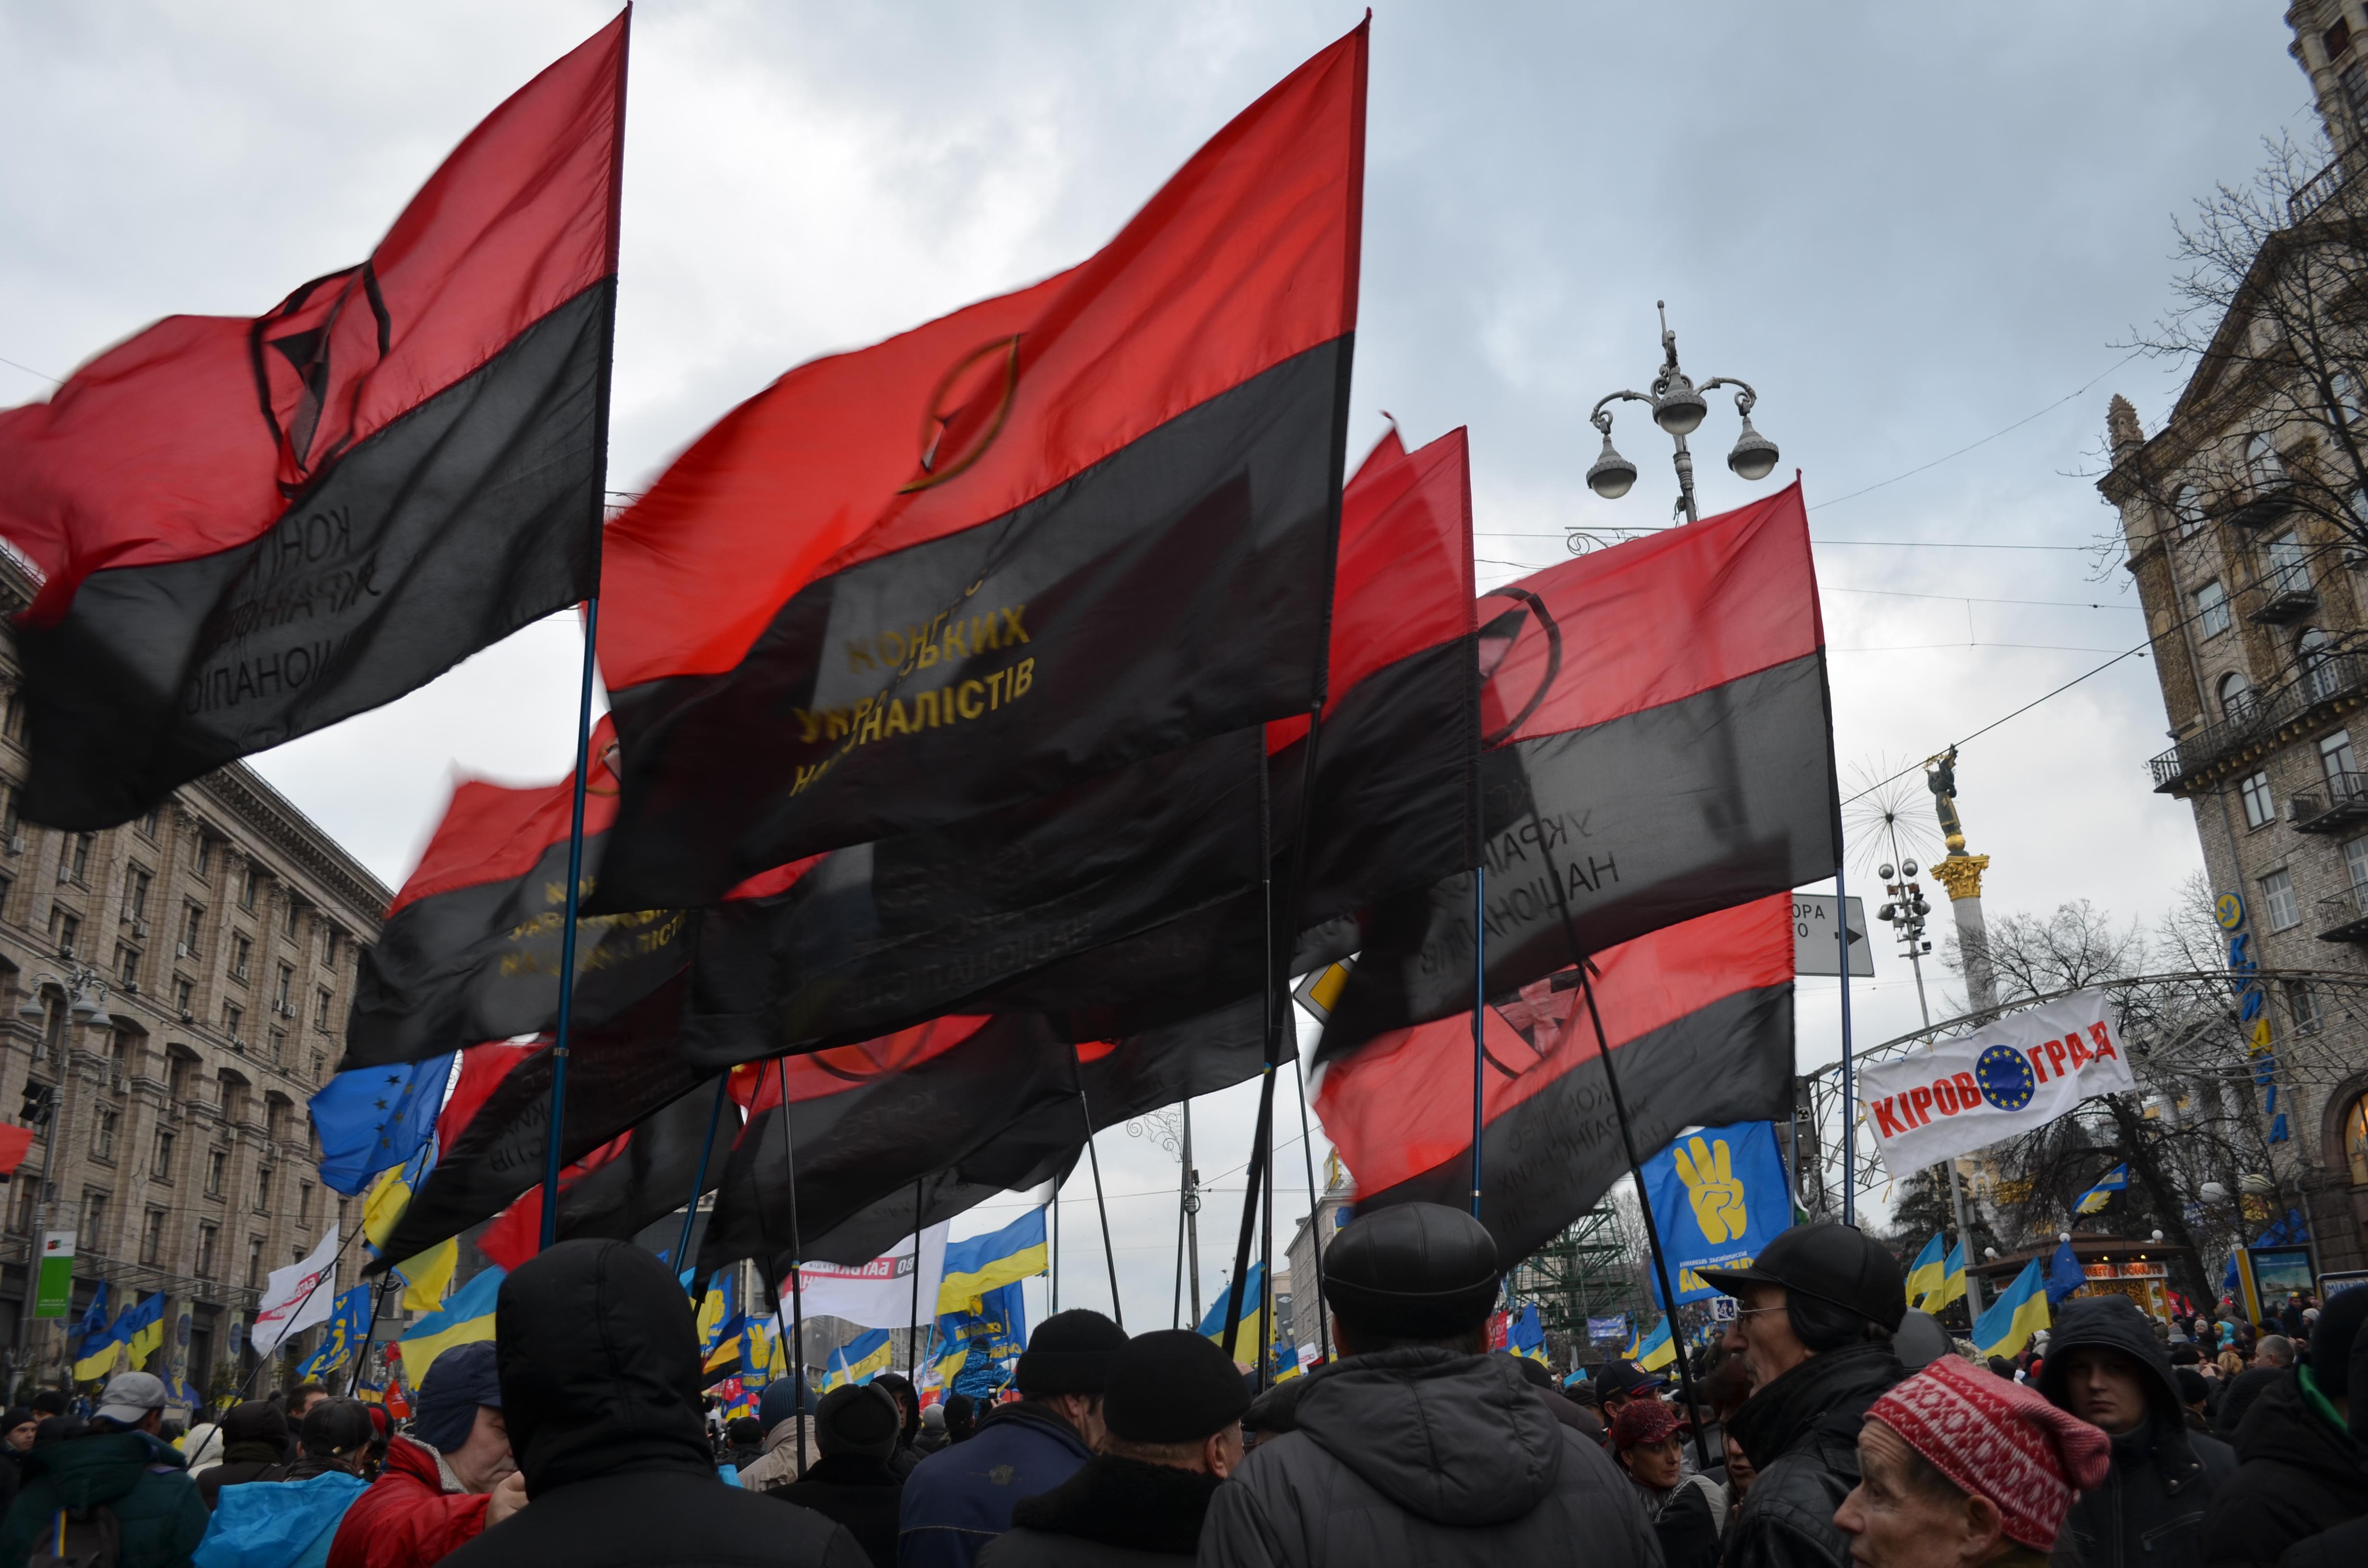 https://upload.wikimedia.org/wikipedia/commons/1/1e/Euromaidan-01-dec-2013_41.JPG